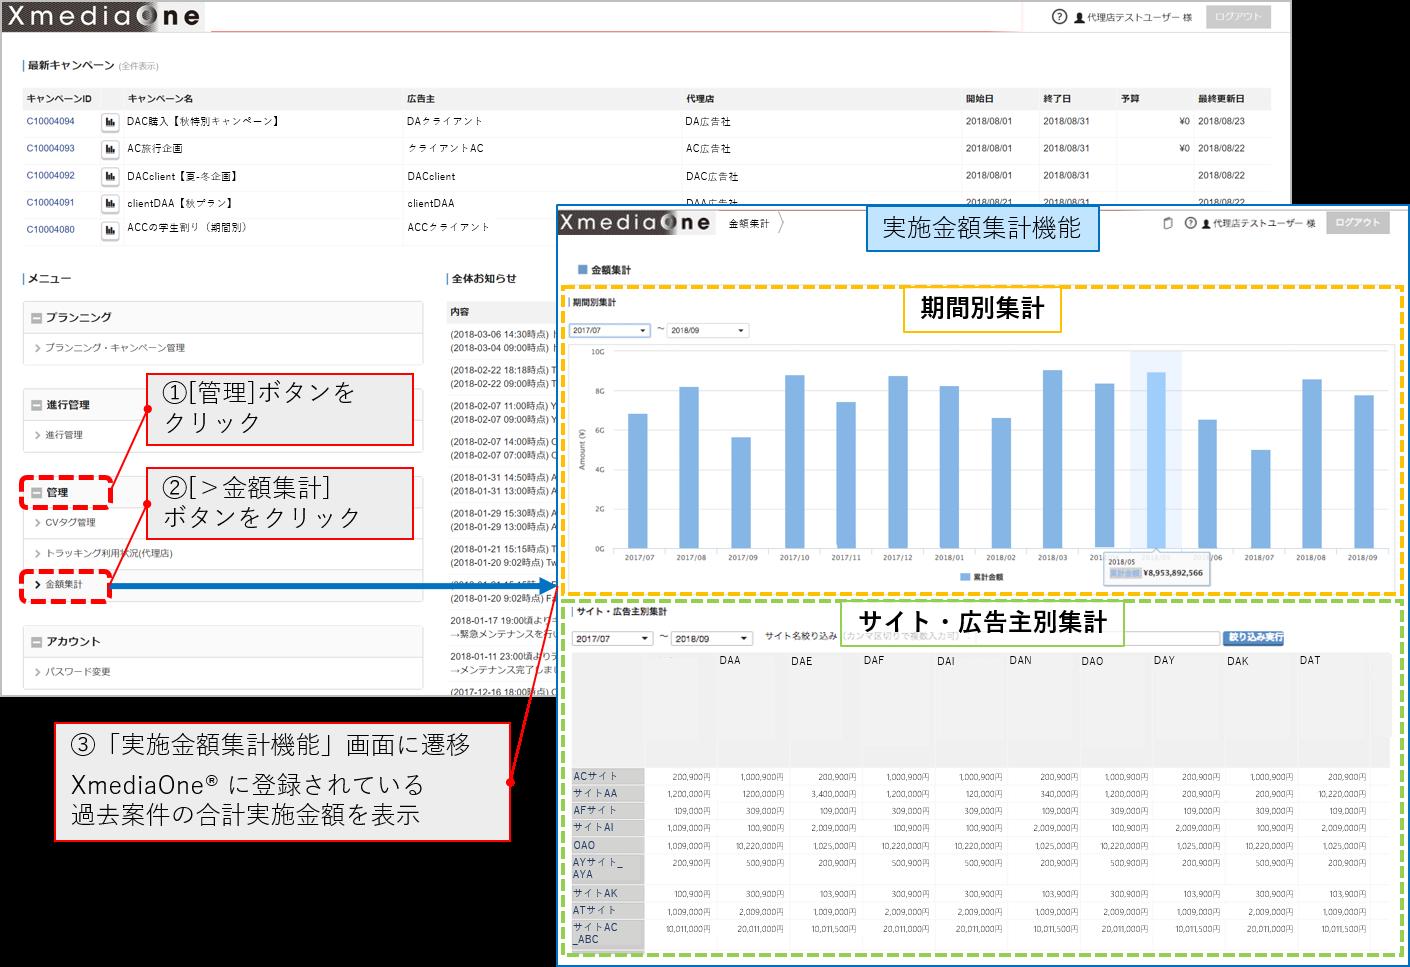 xmediaone-function-planning-data-image4